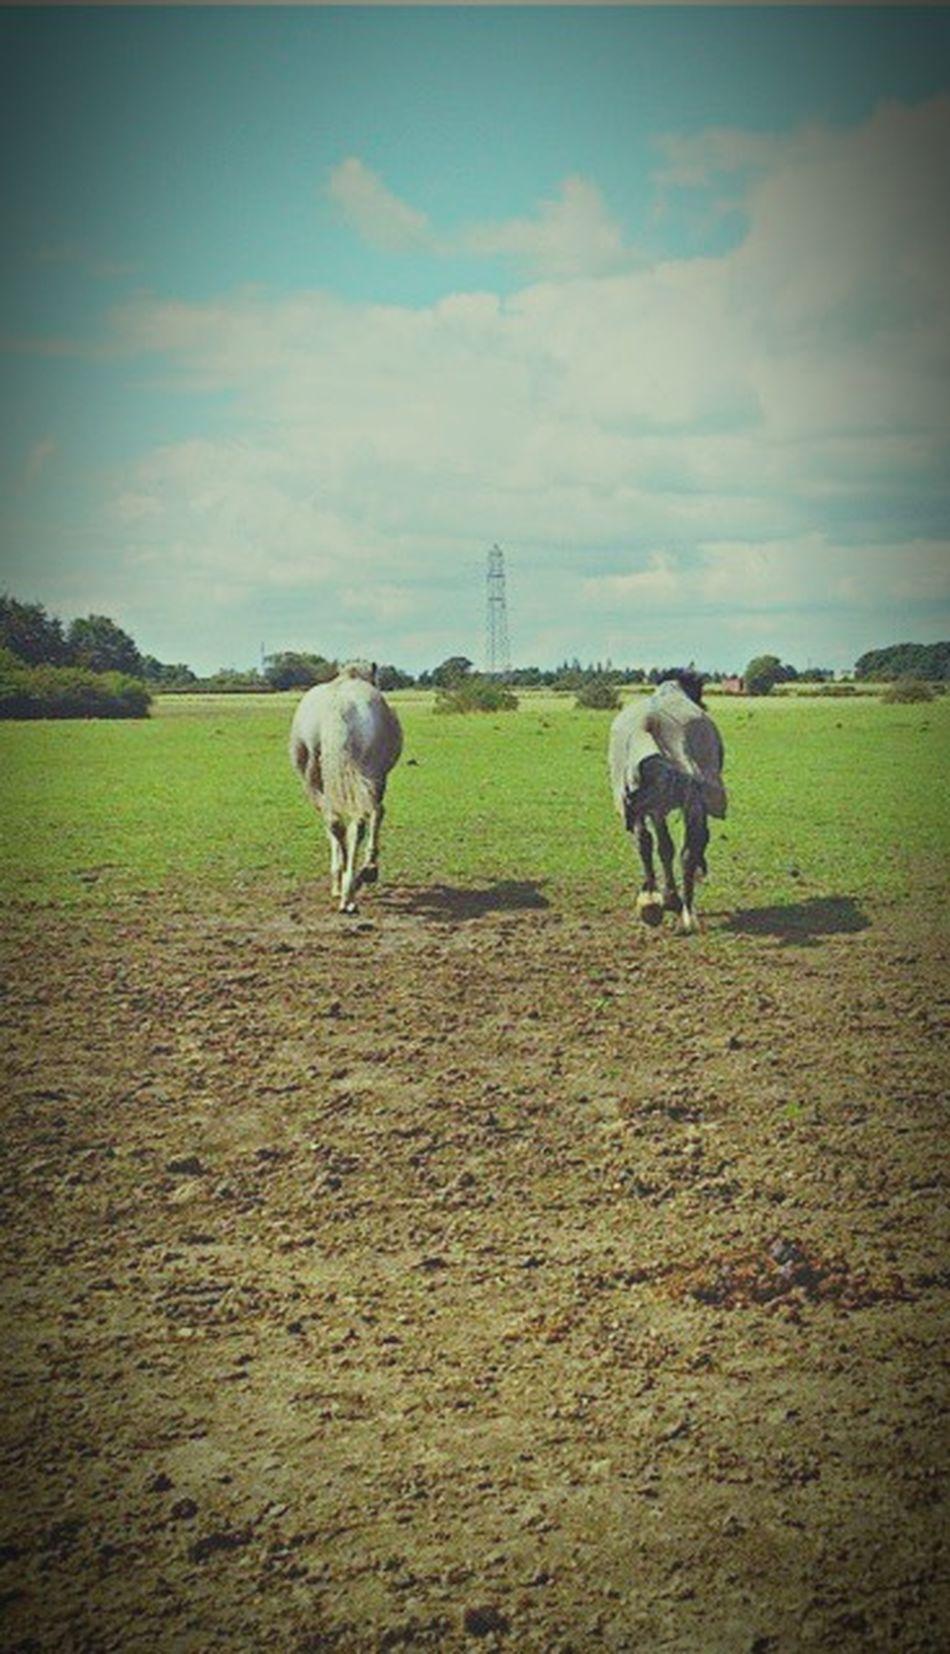 More Horses Trottinghorse Trotting Sky In Unison Fields Land